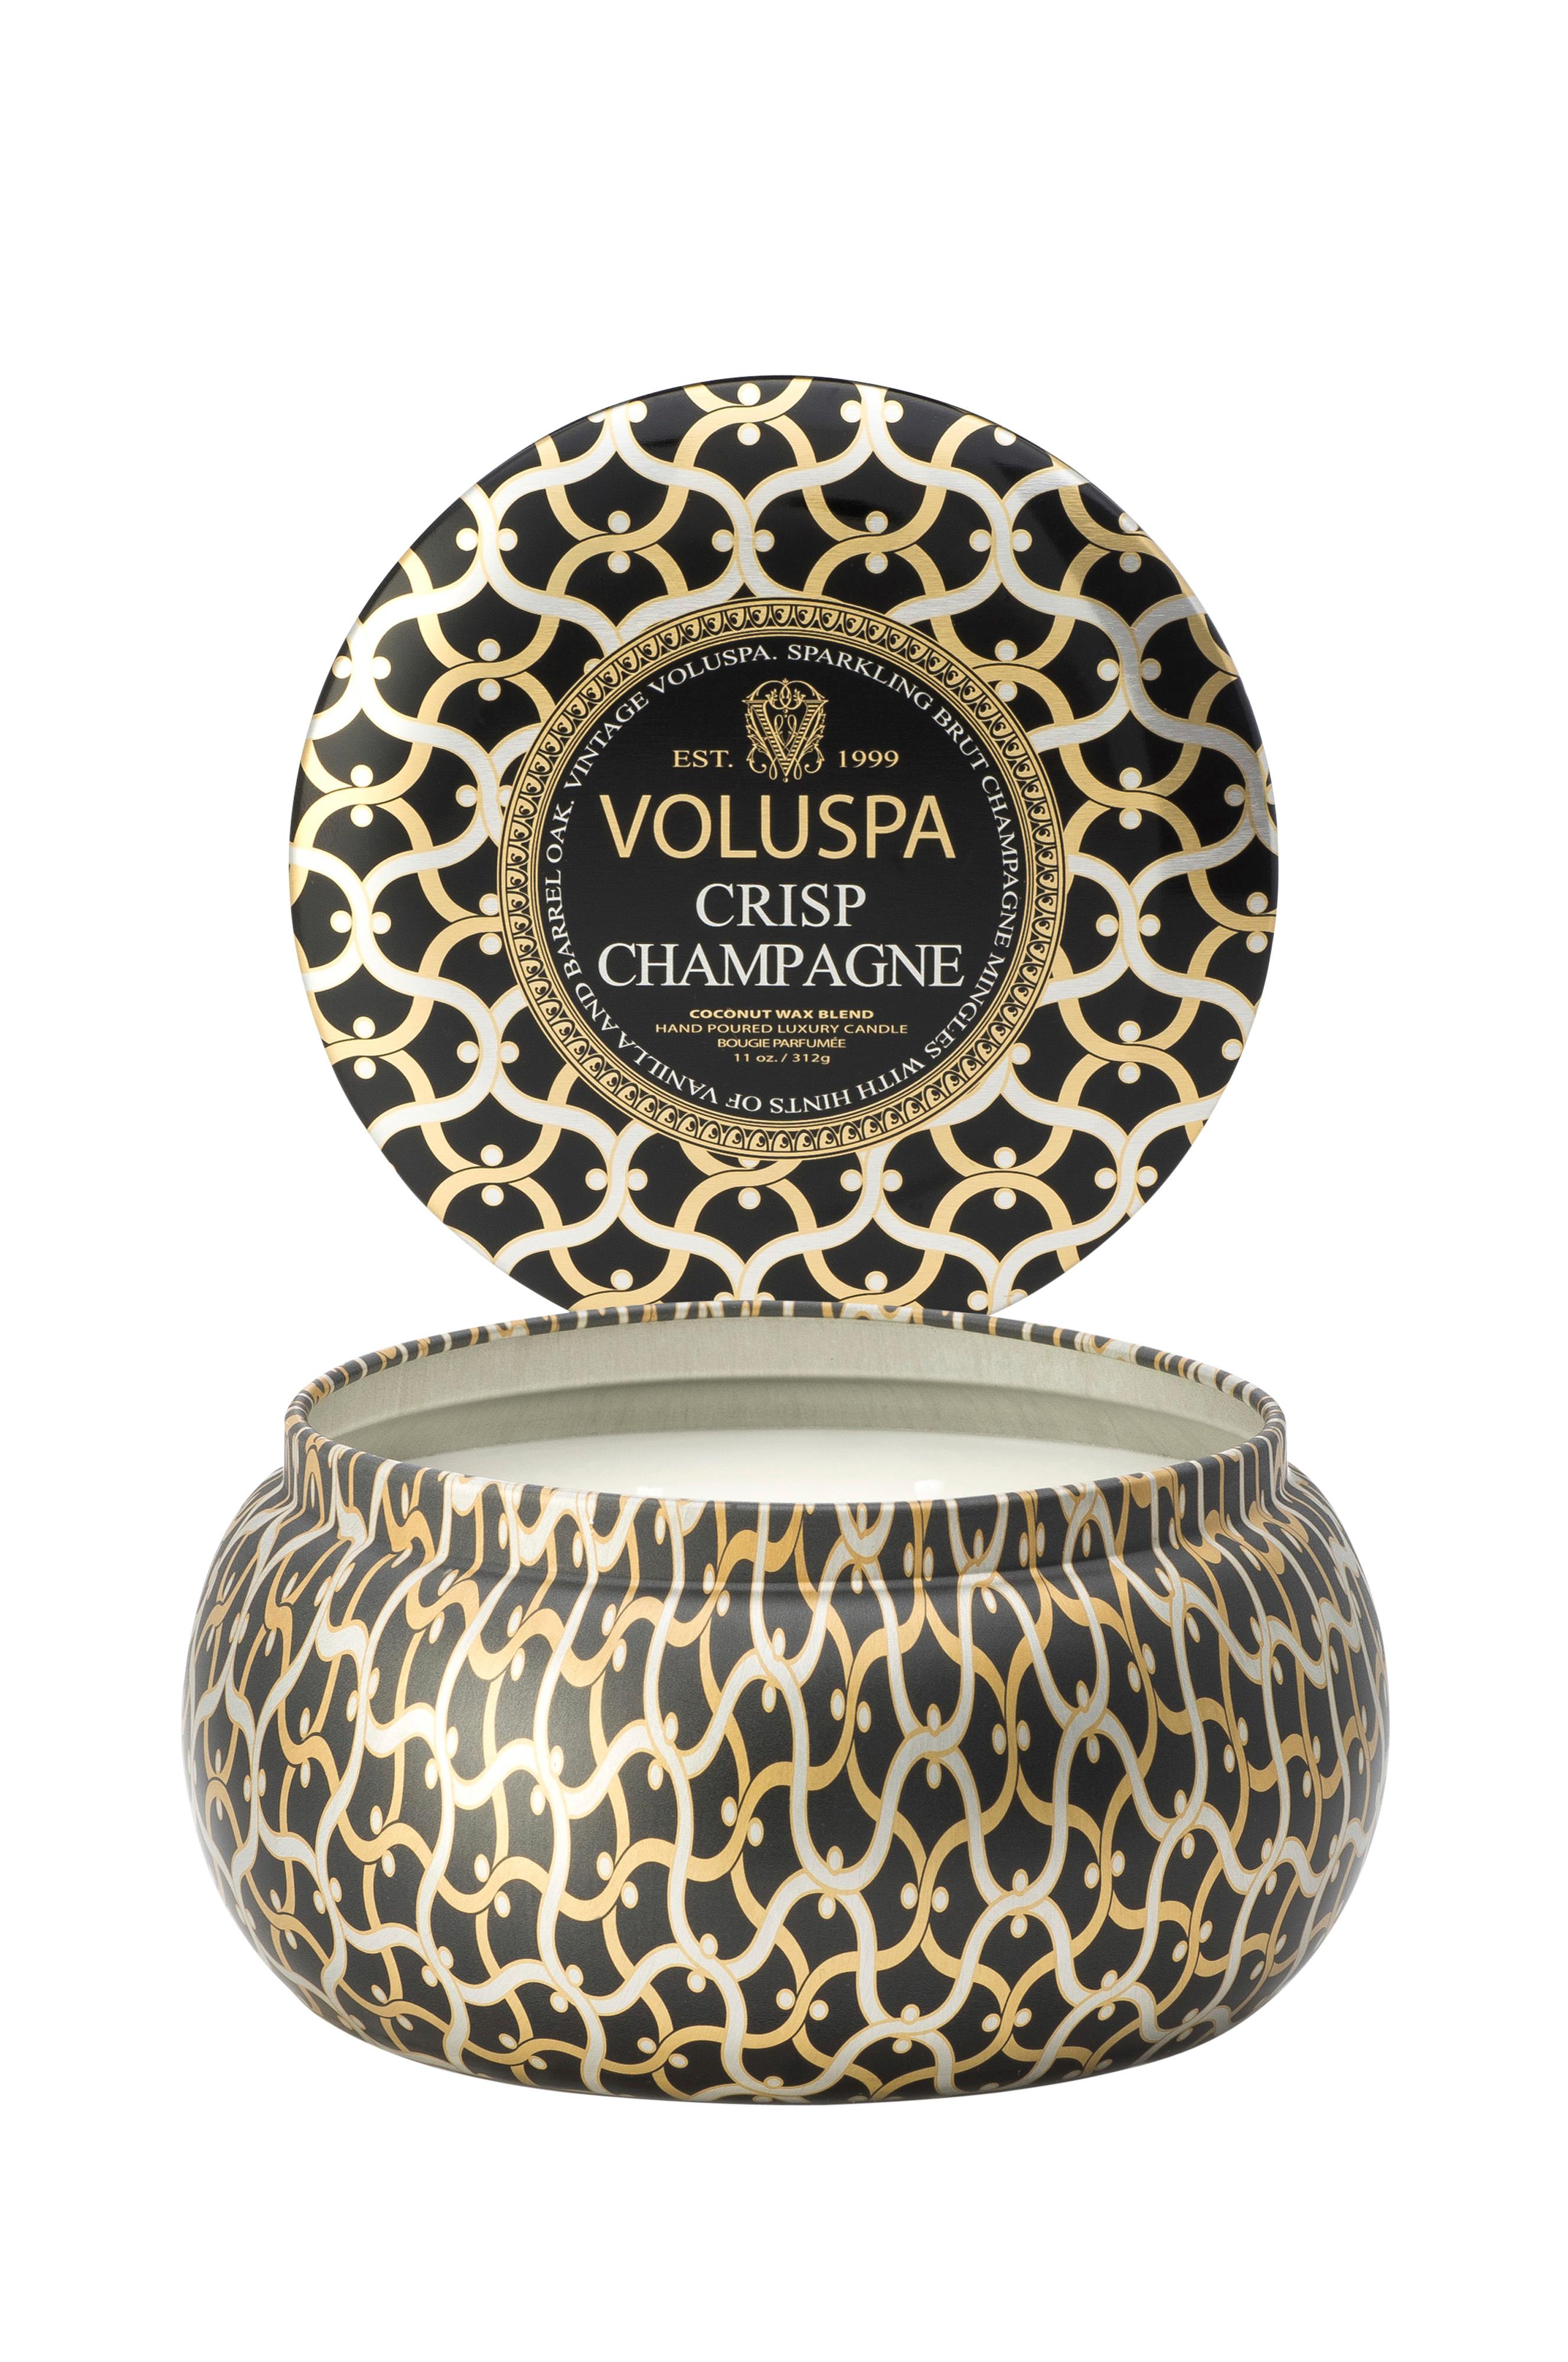 bli billig exklusiva skor detailing Voluspa Crisp Champagne - 2 Wick Maison Metallo Candle 50h - Hem ...